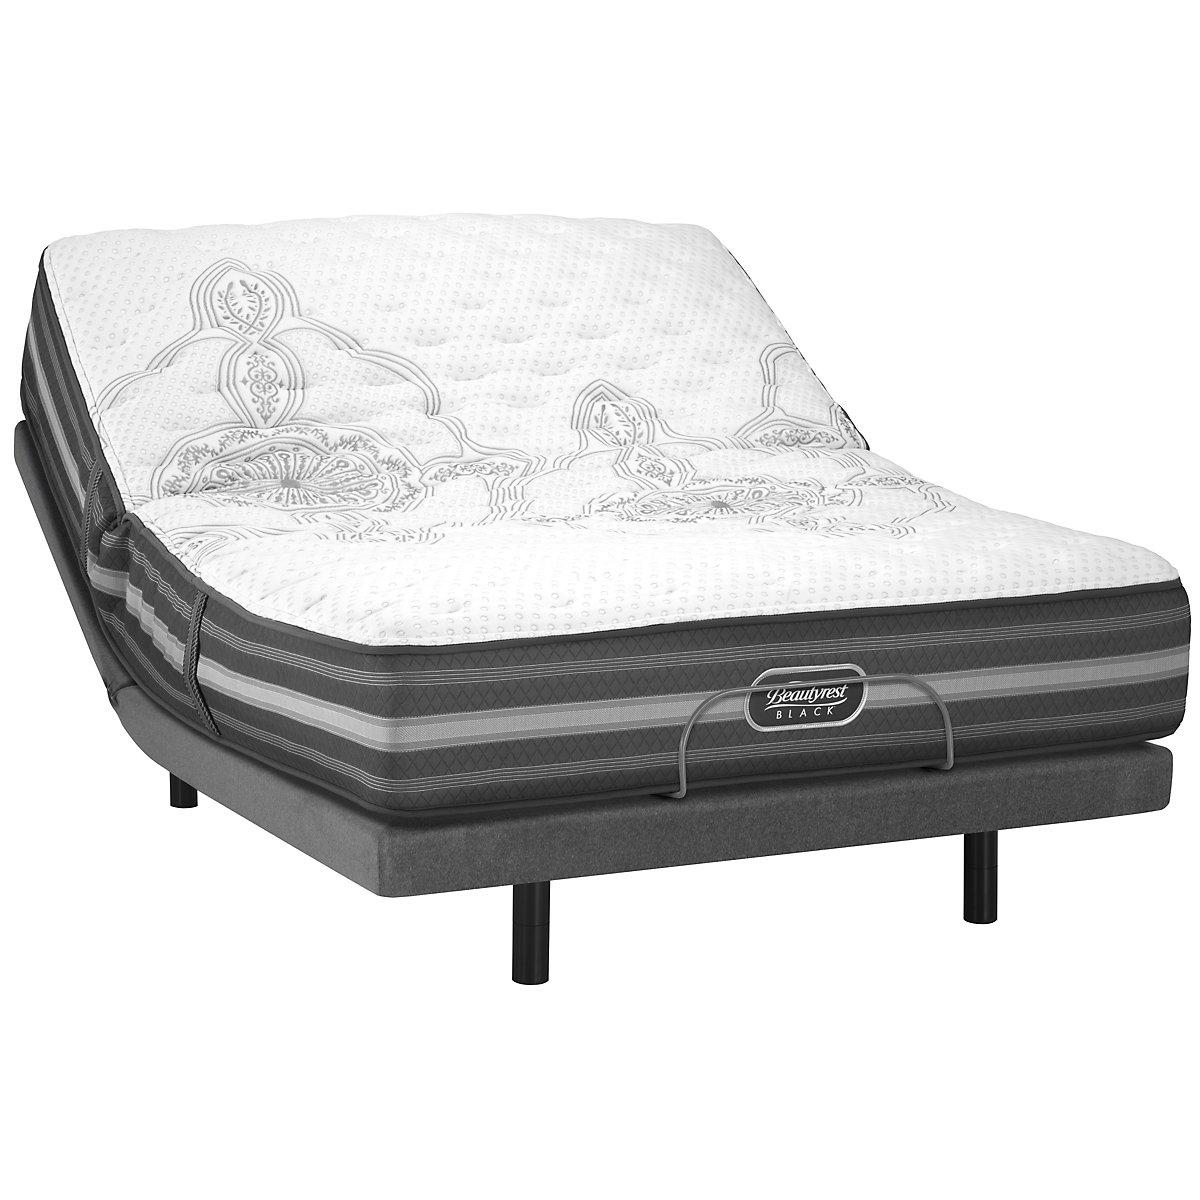 Elite adjustable beds reviews : City furniture beautyrest black calista extra firm